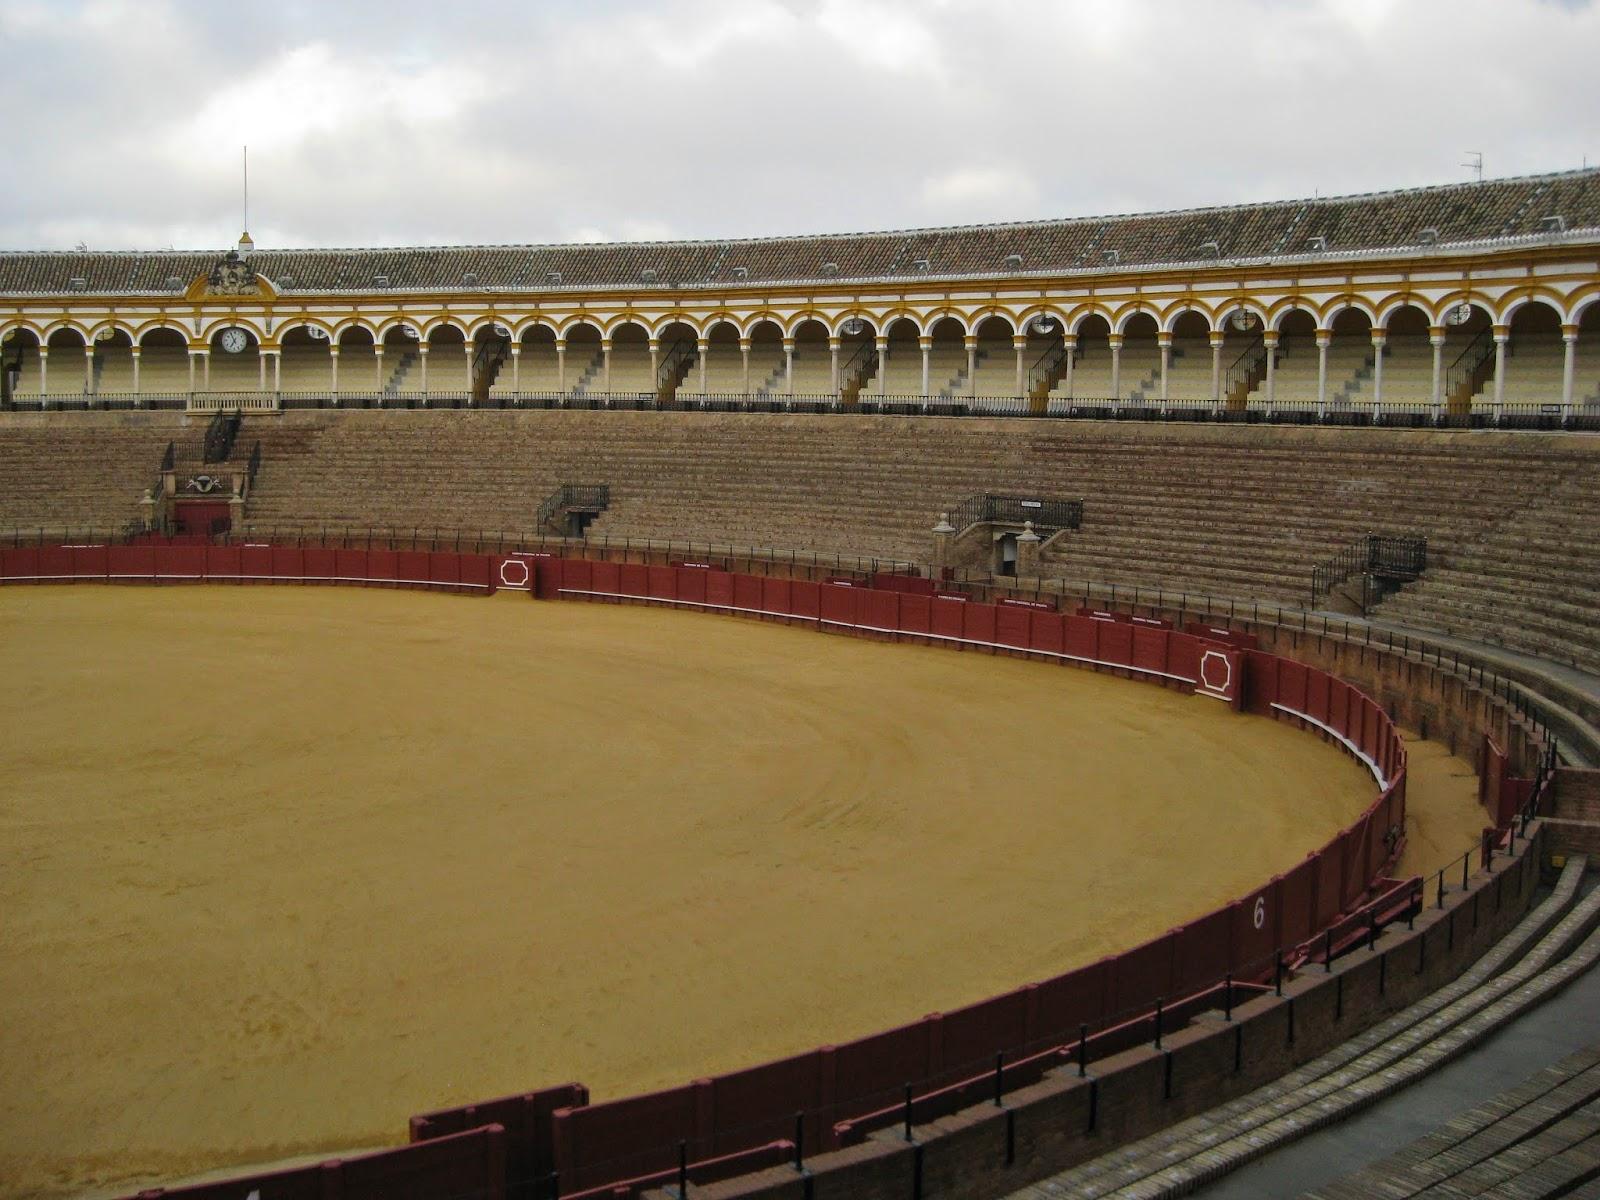 Seville - Bullfight arena